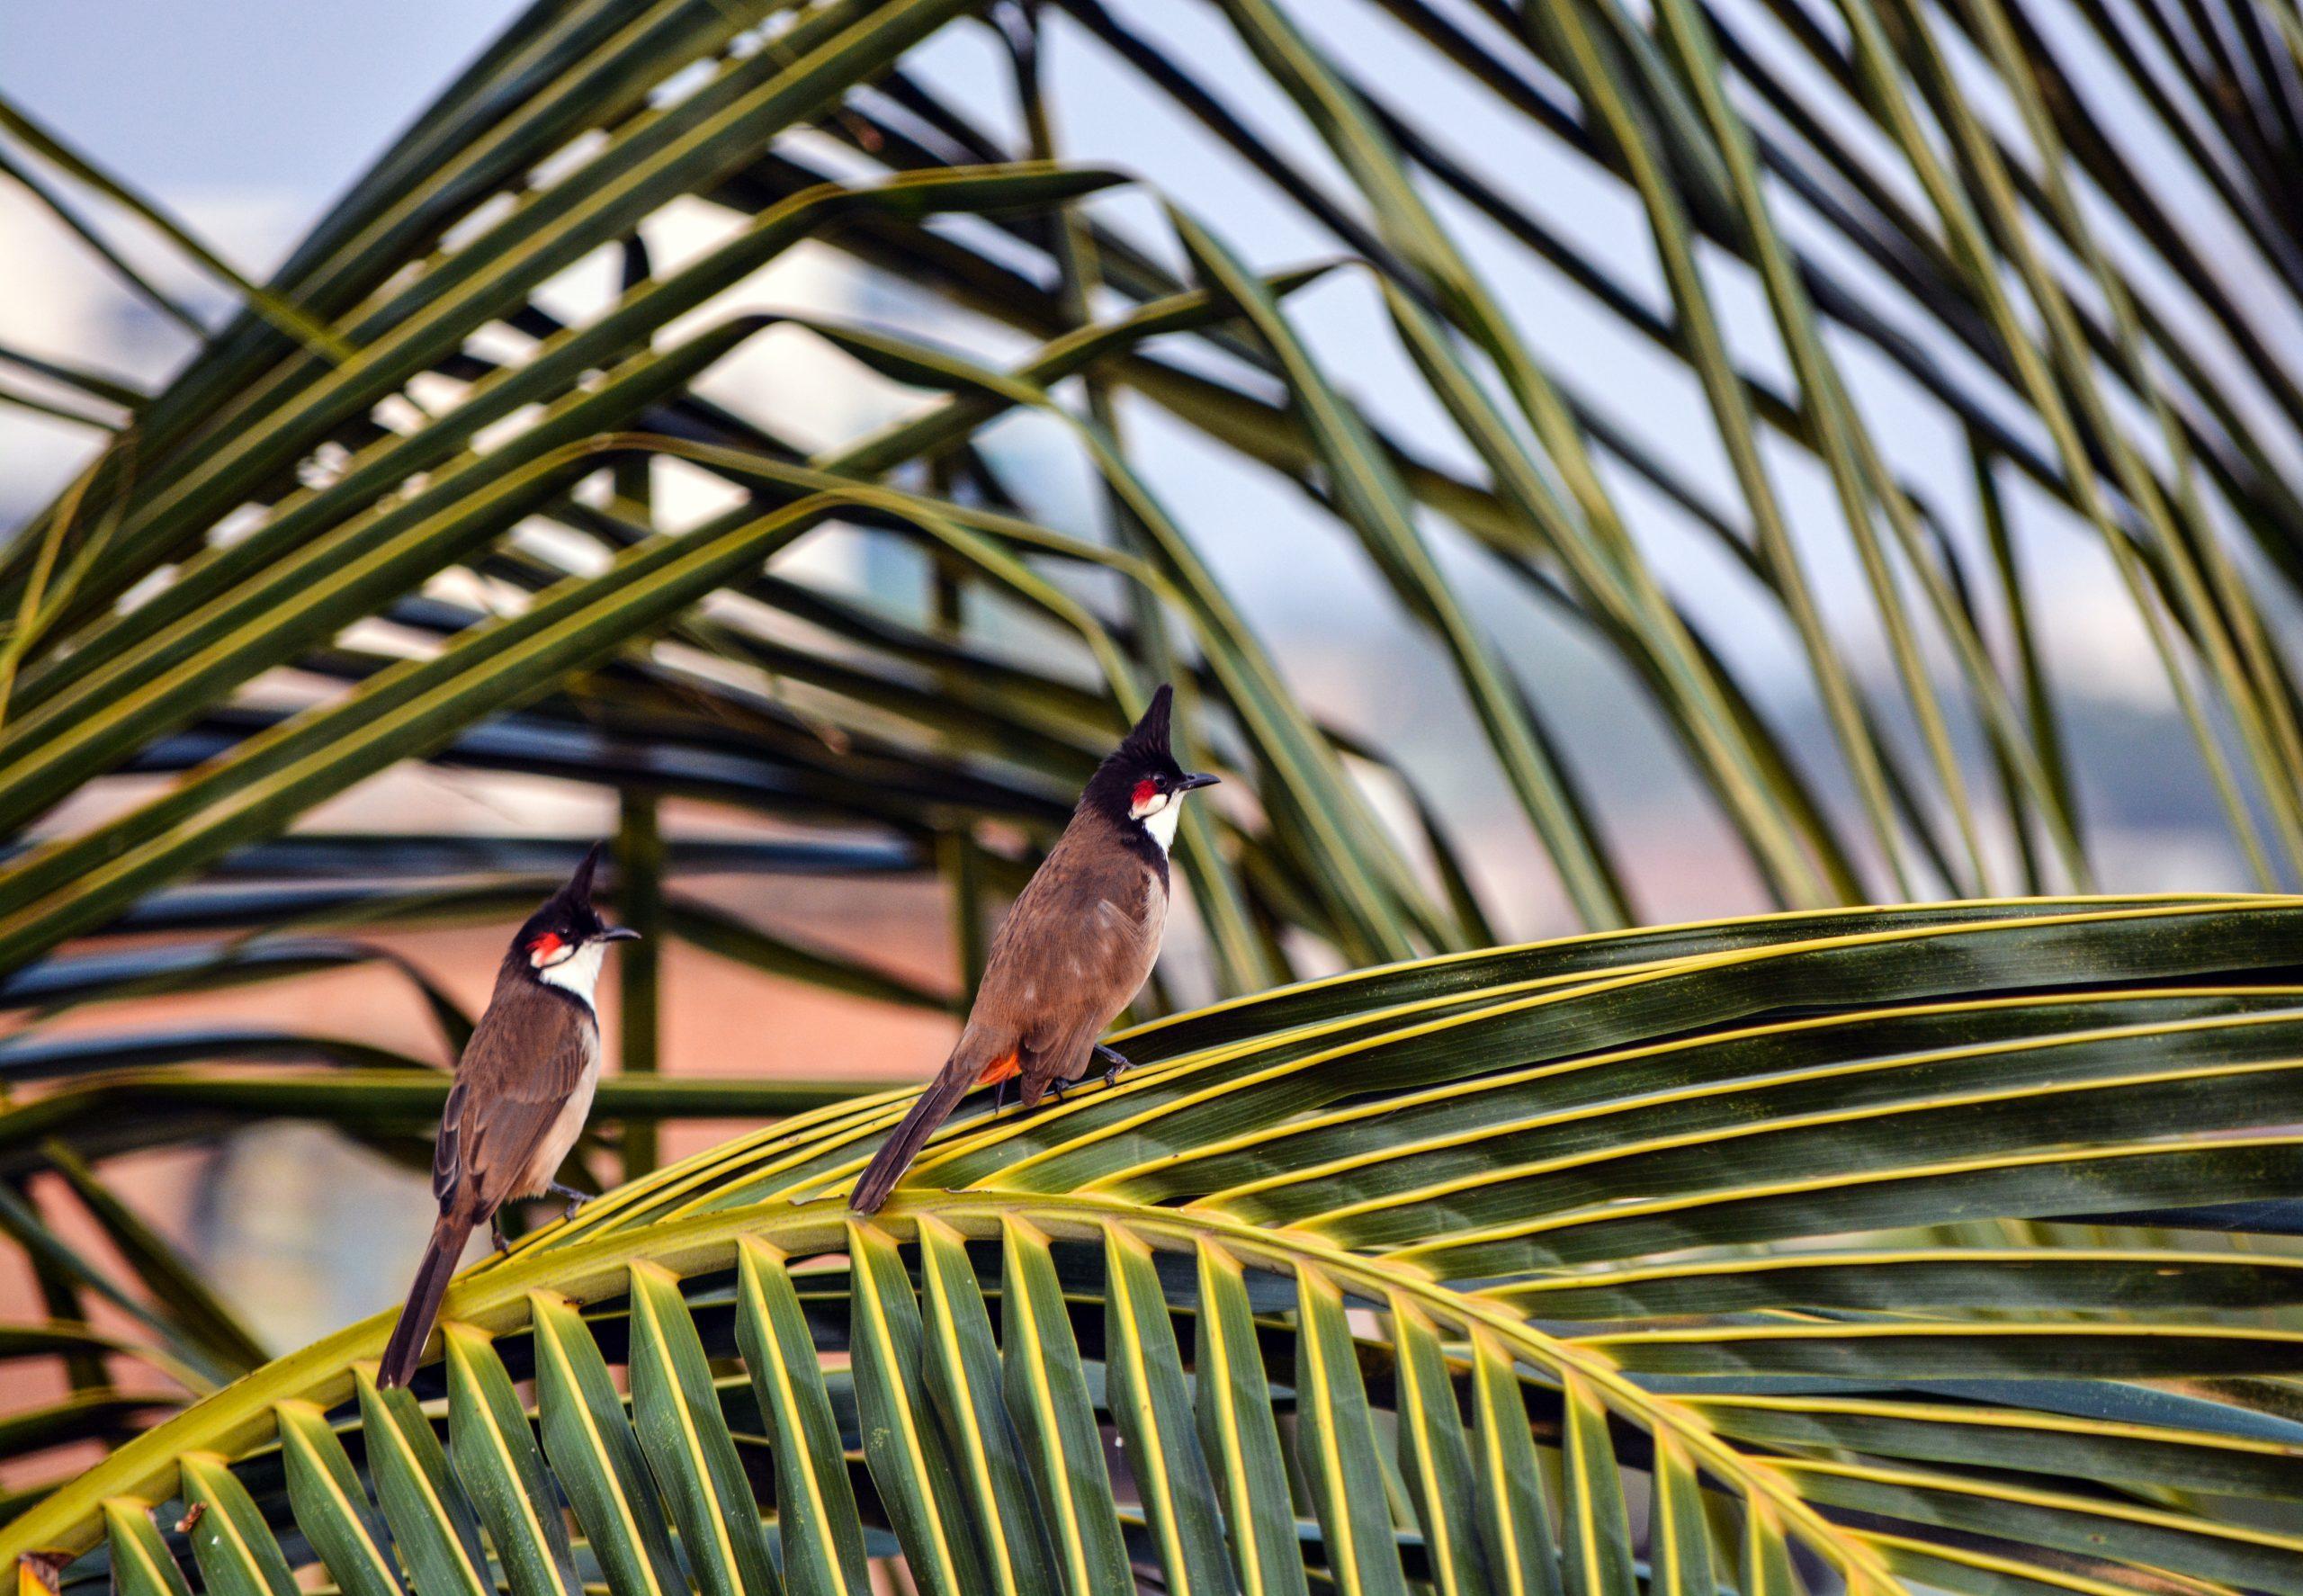 Birds at a branch